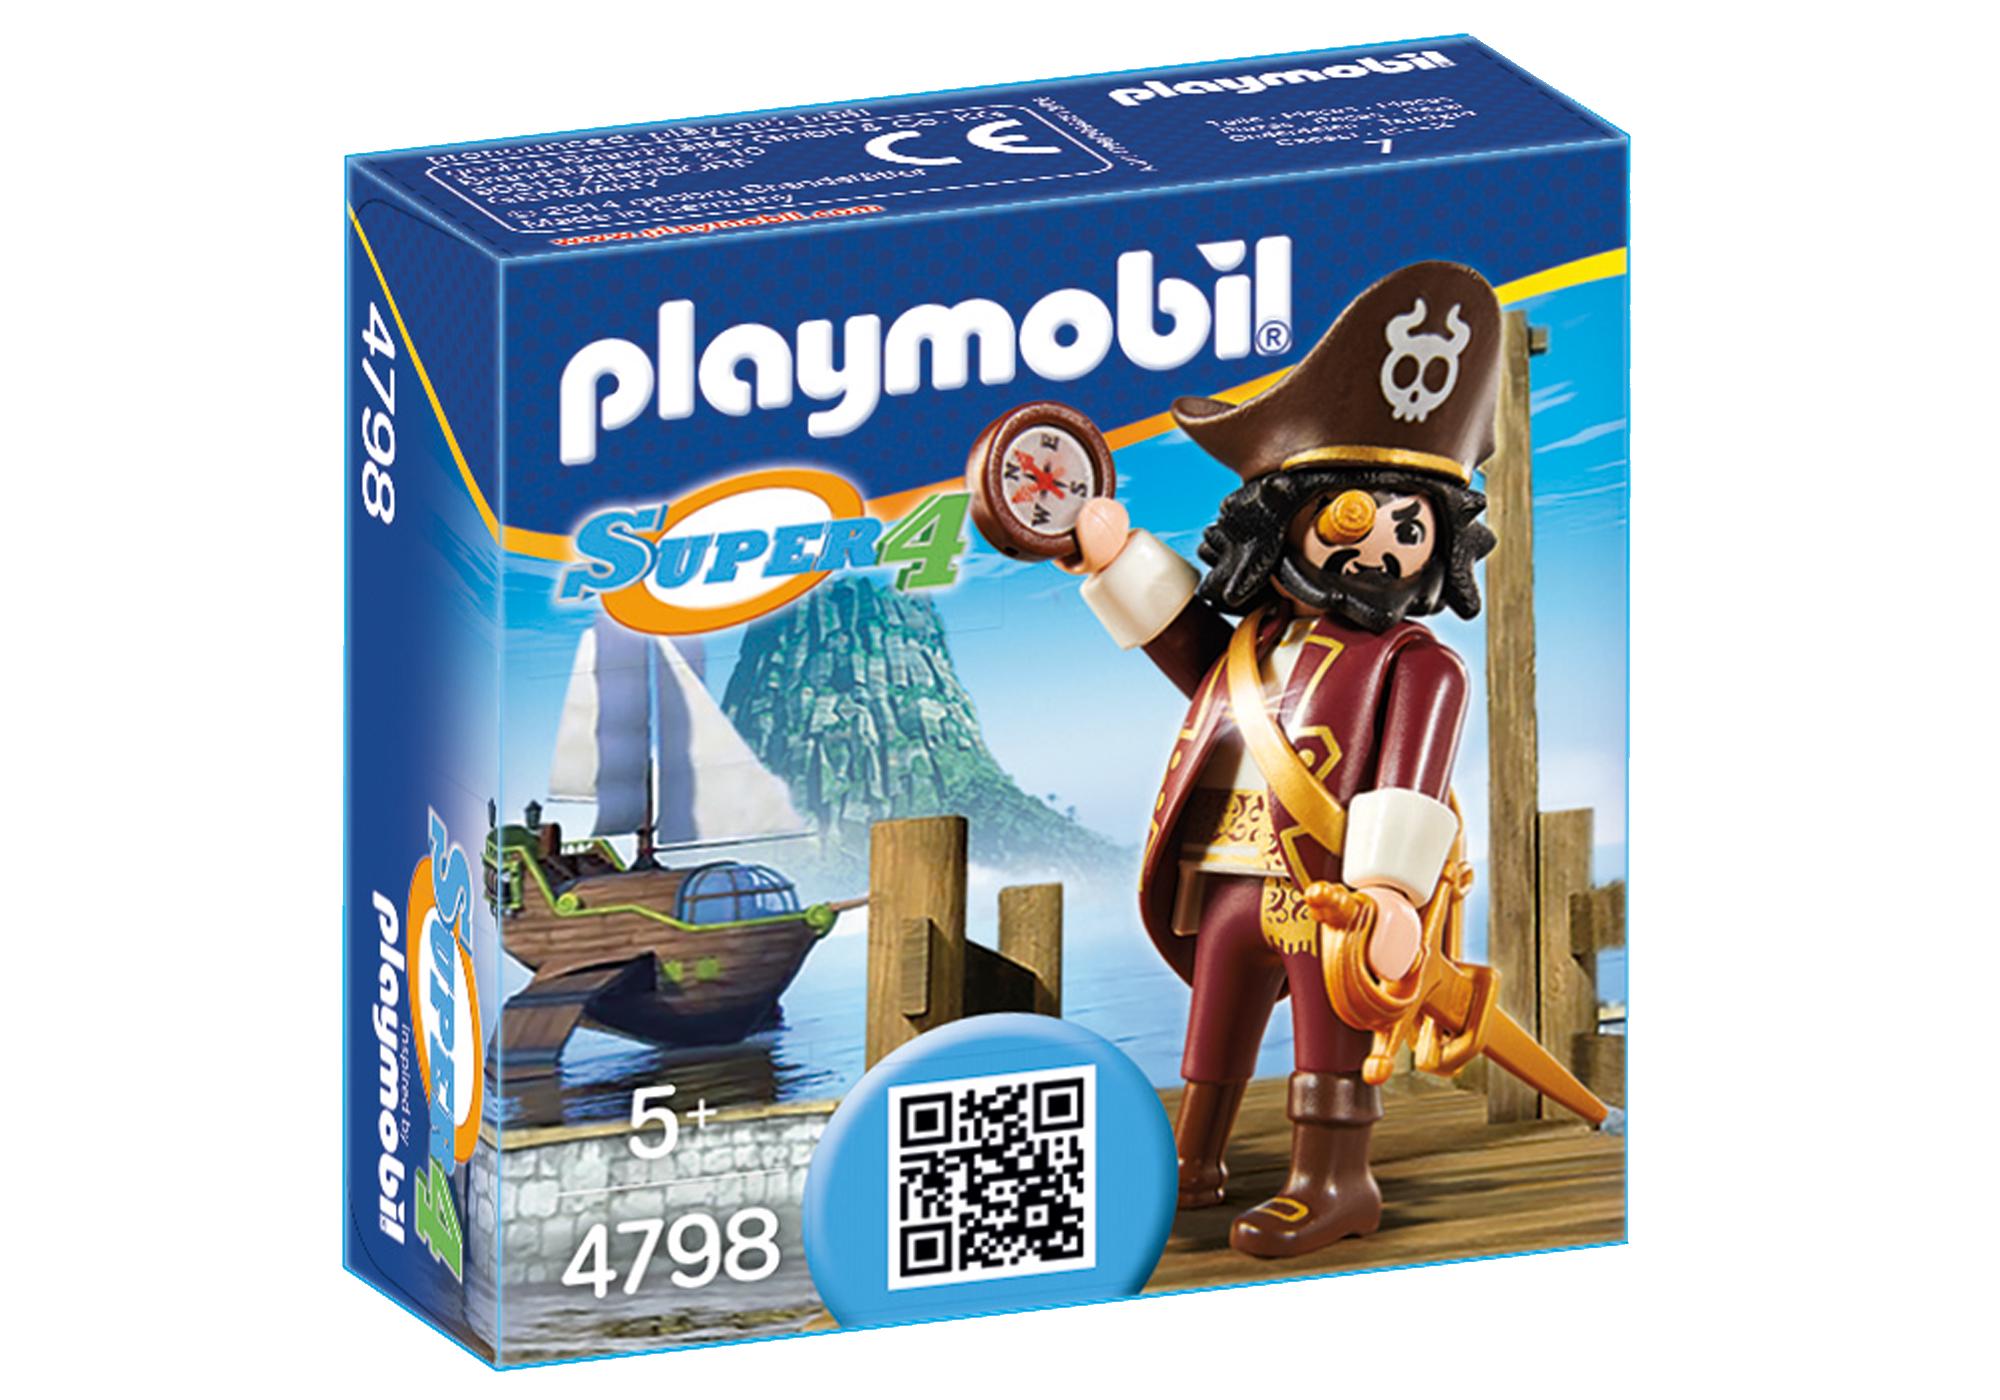 http://media.playmobil.com/i/playmobil/4798_product_box_front/Sharkbeard